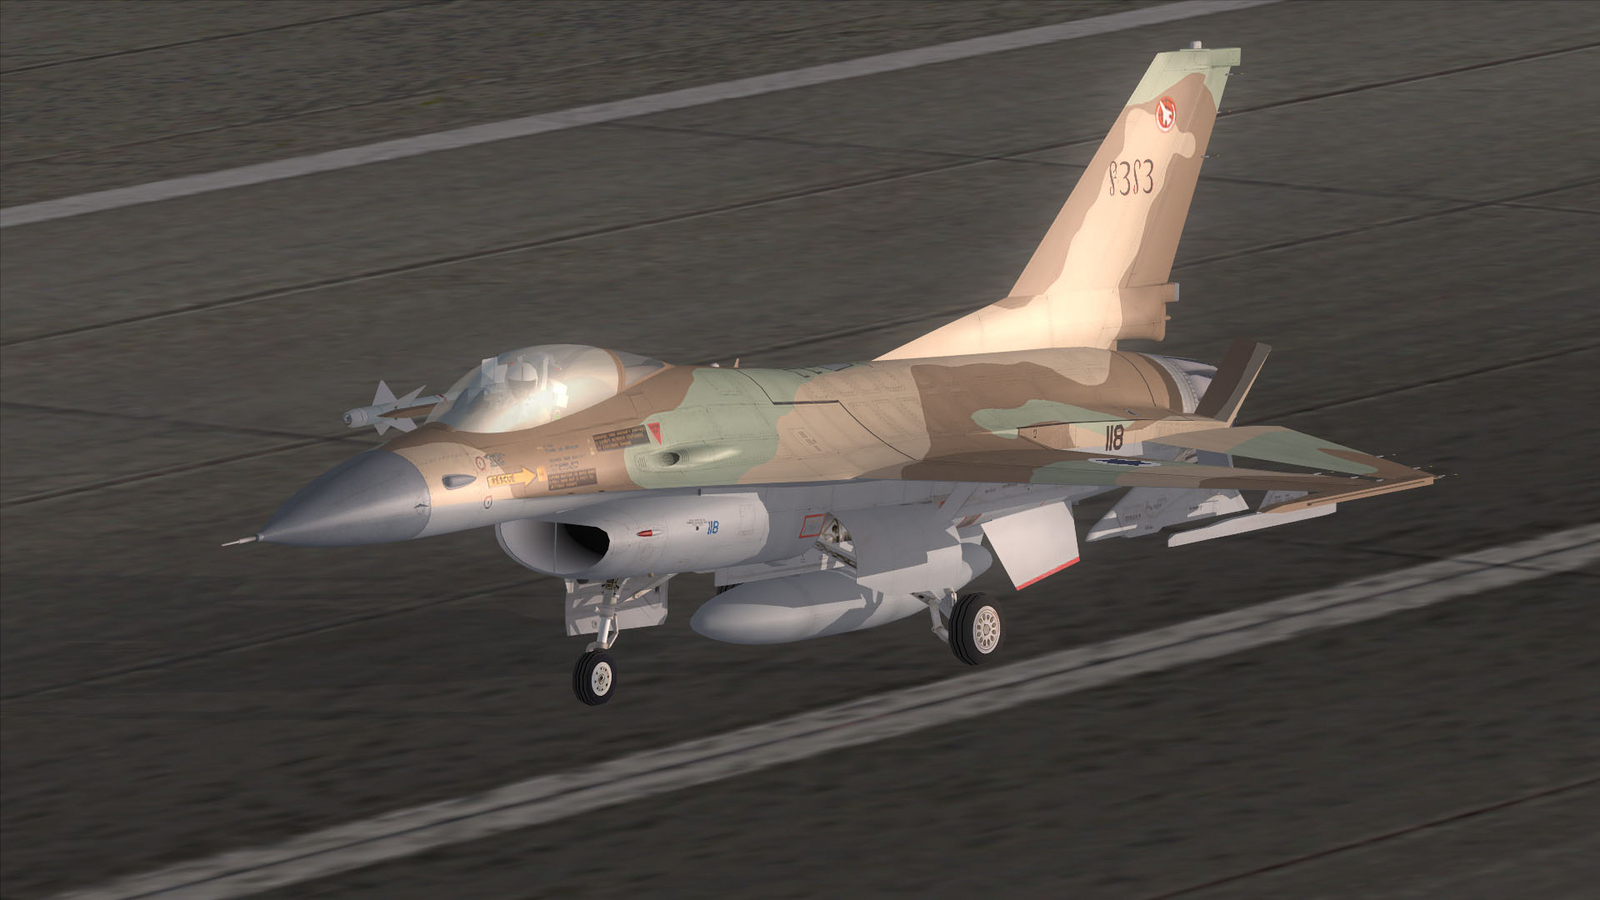 118 (Tsil-Tsal) of 117 Squadron